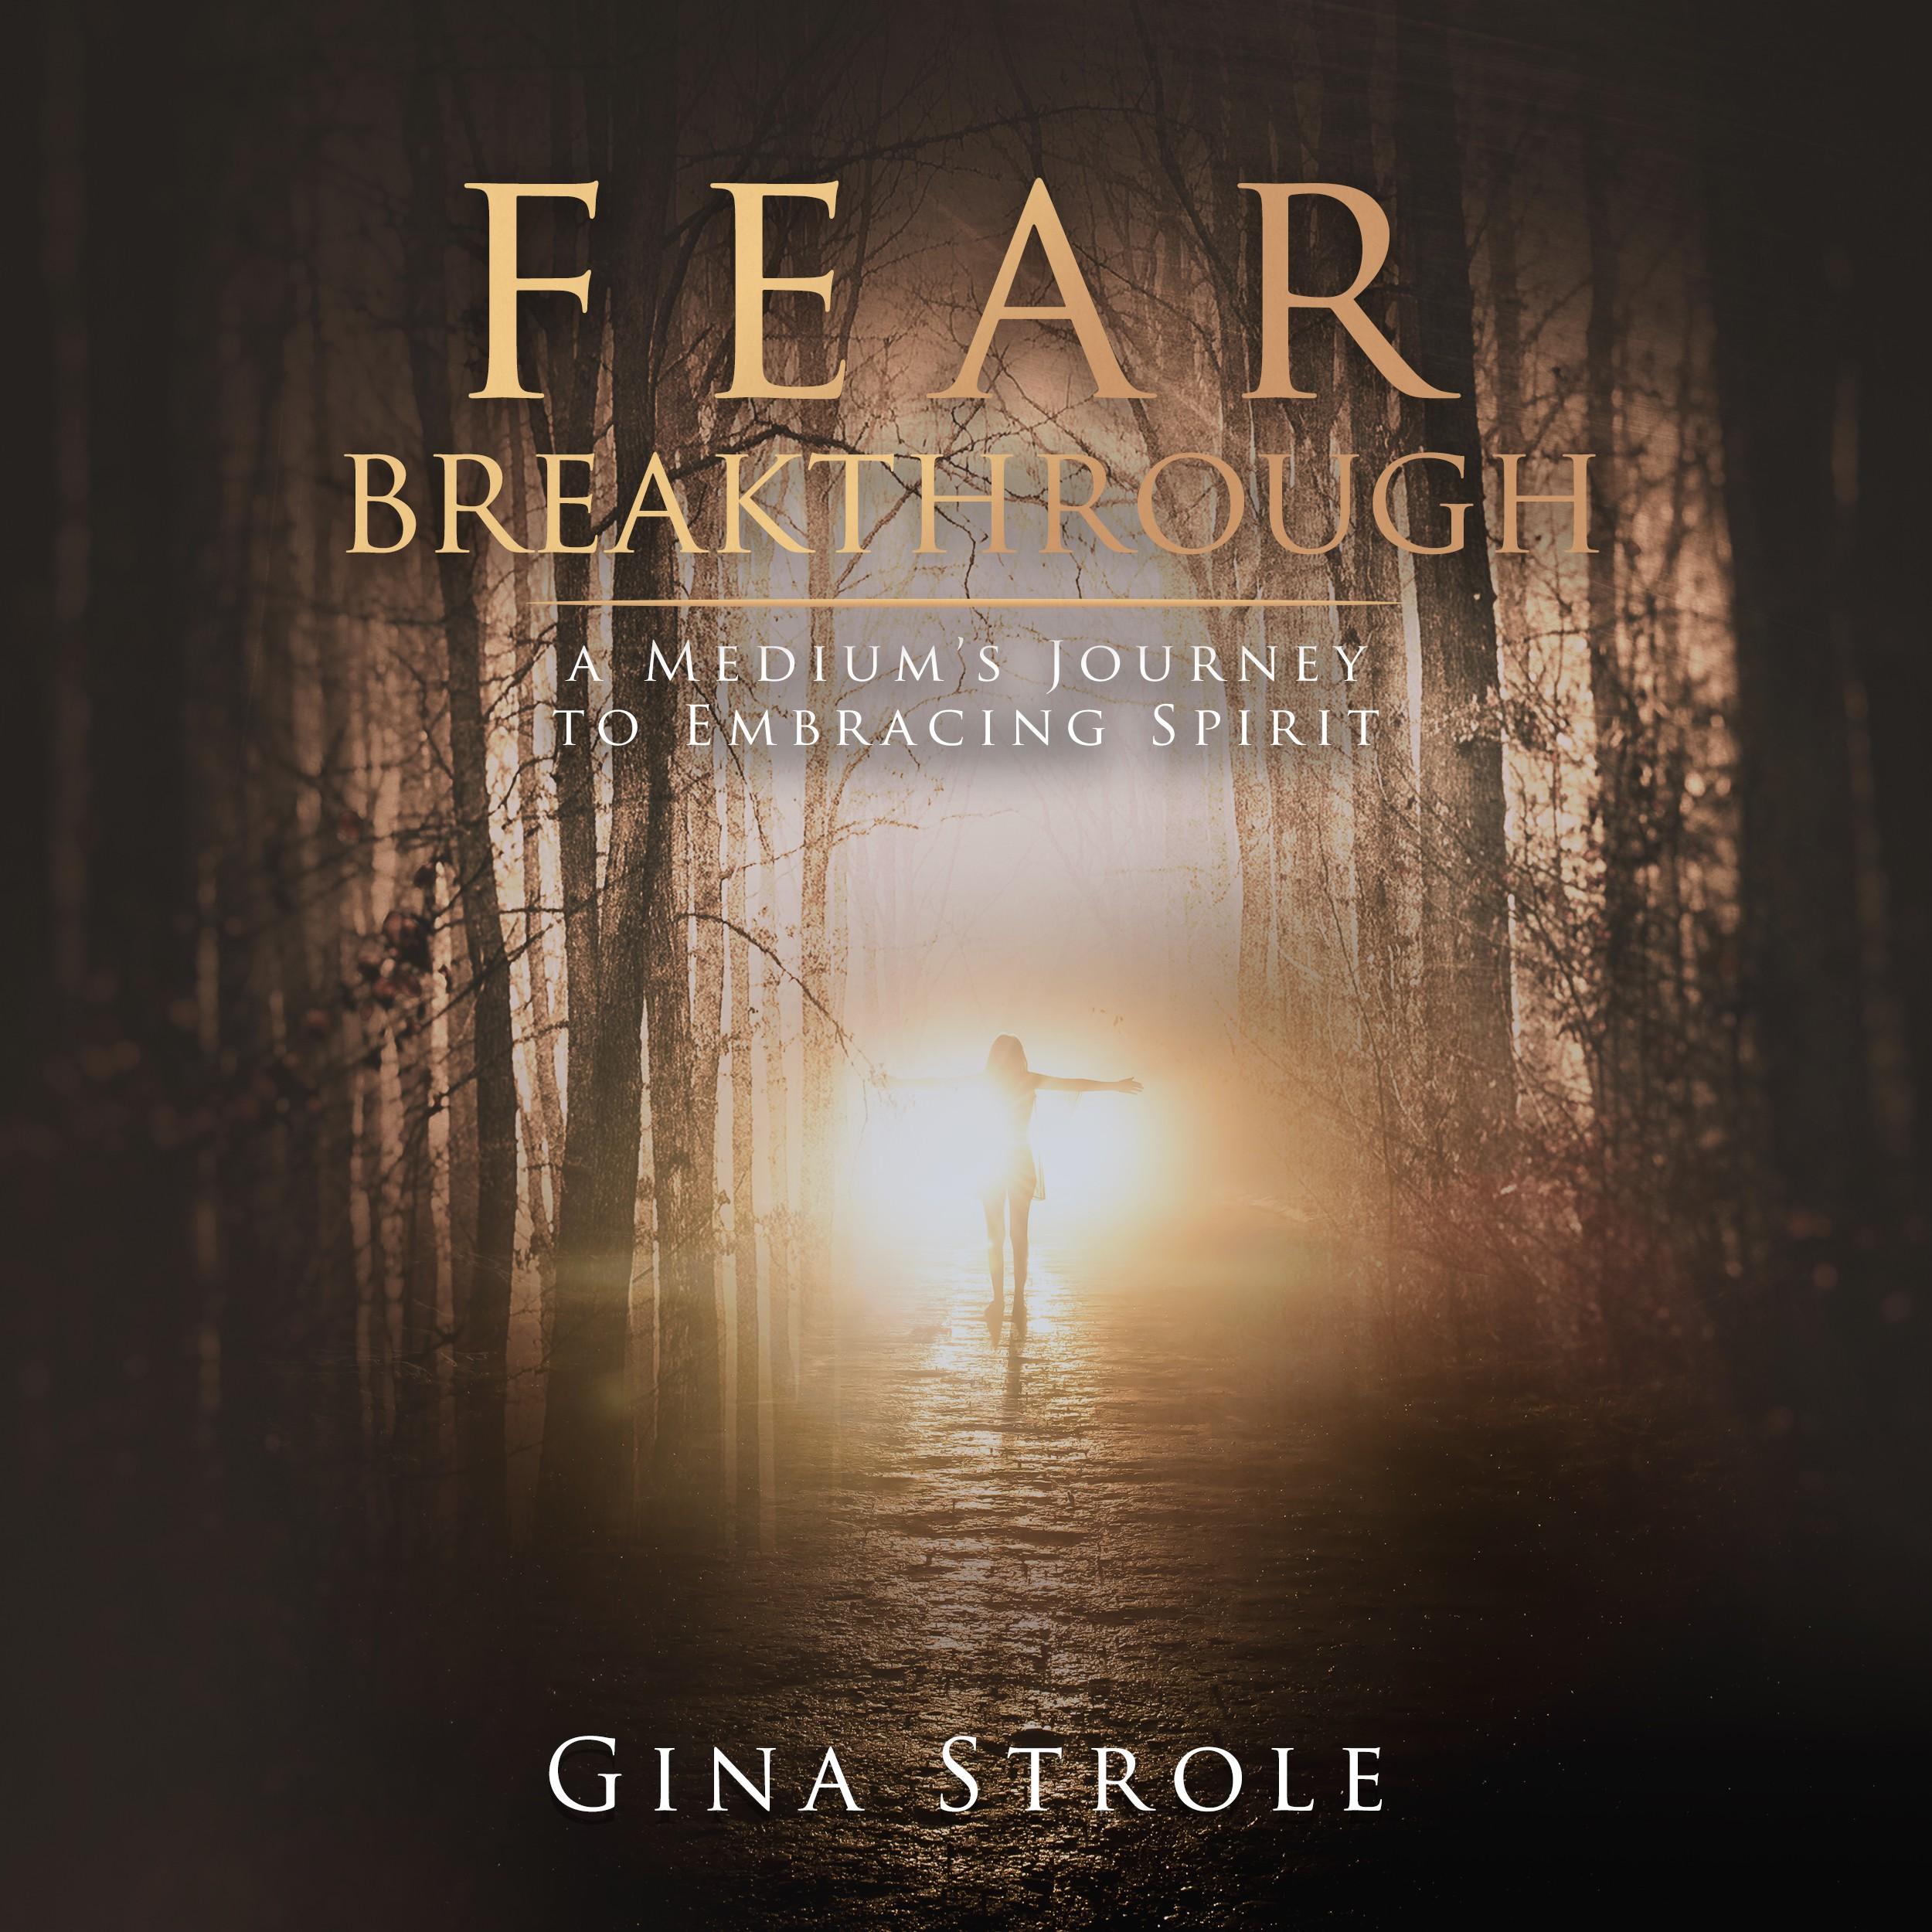 Fear breakthrough